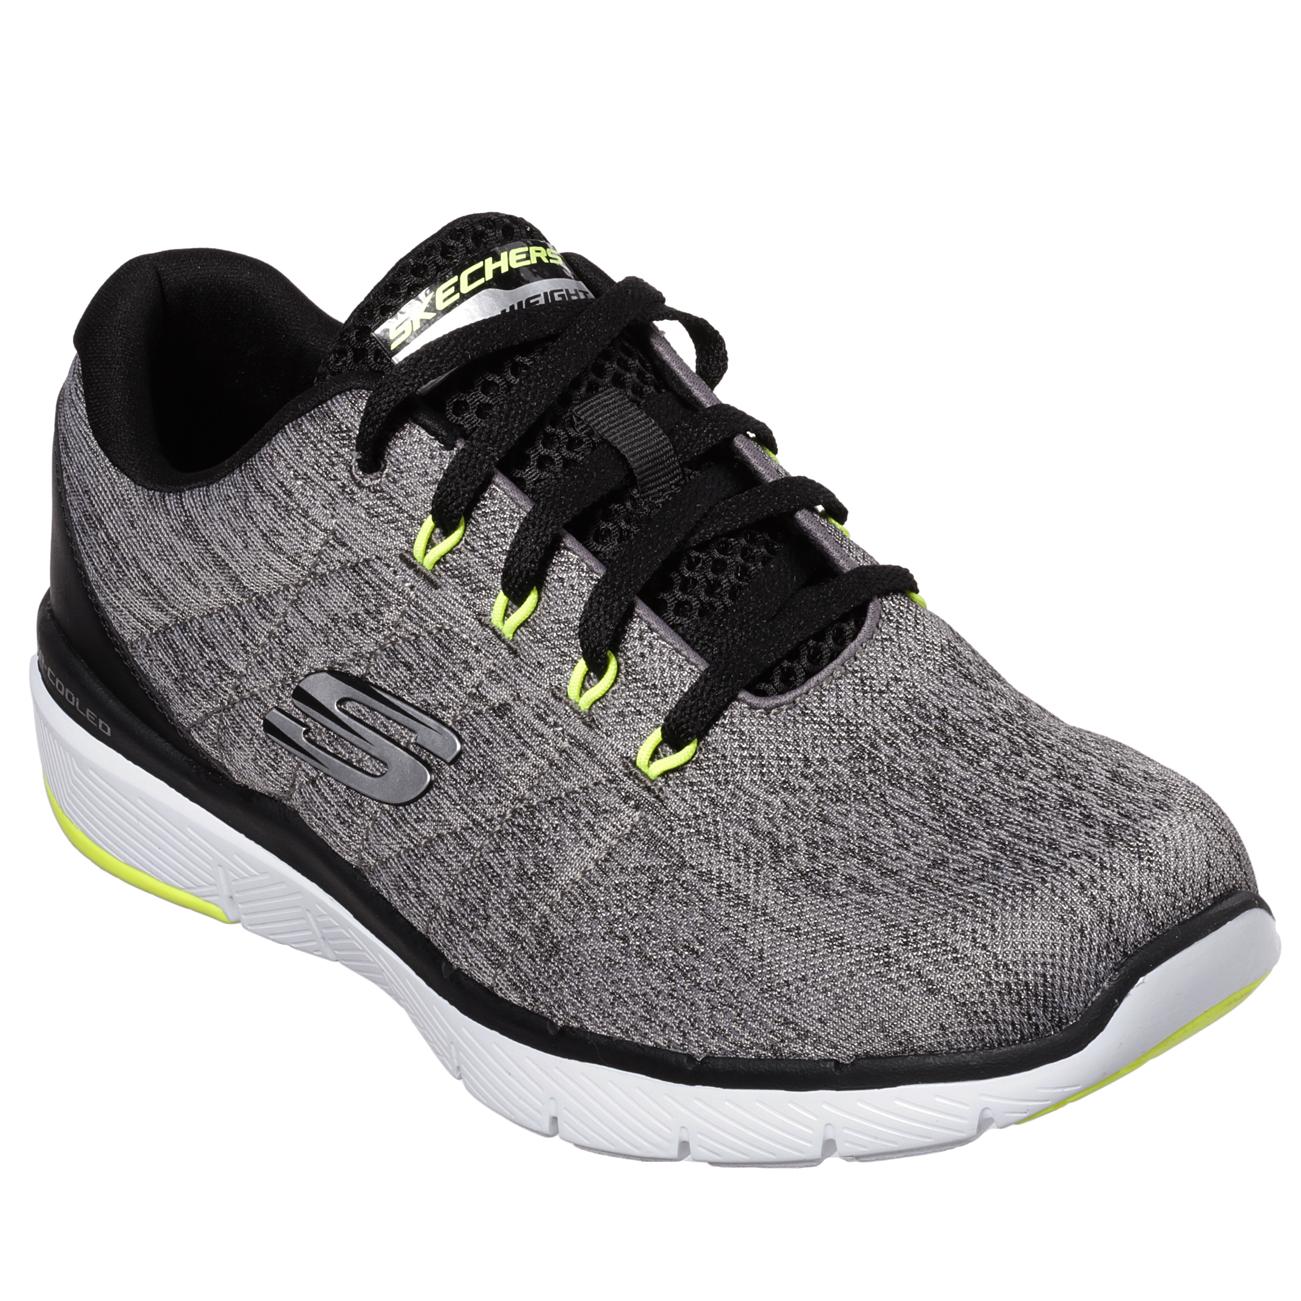 Walking Uomo Skechers Flex Advantage 3.0 Stally Lightweight Walking  Gym Trainers UK 7-12 b21aa9